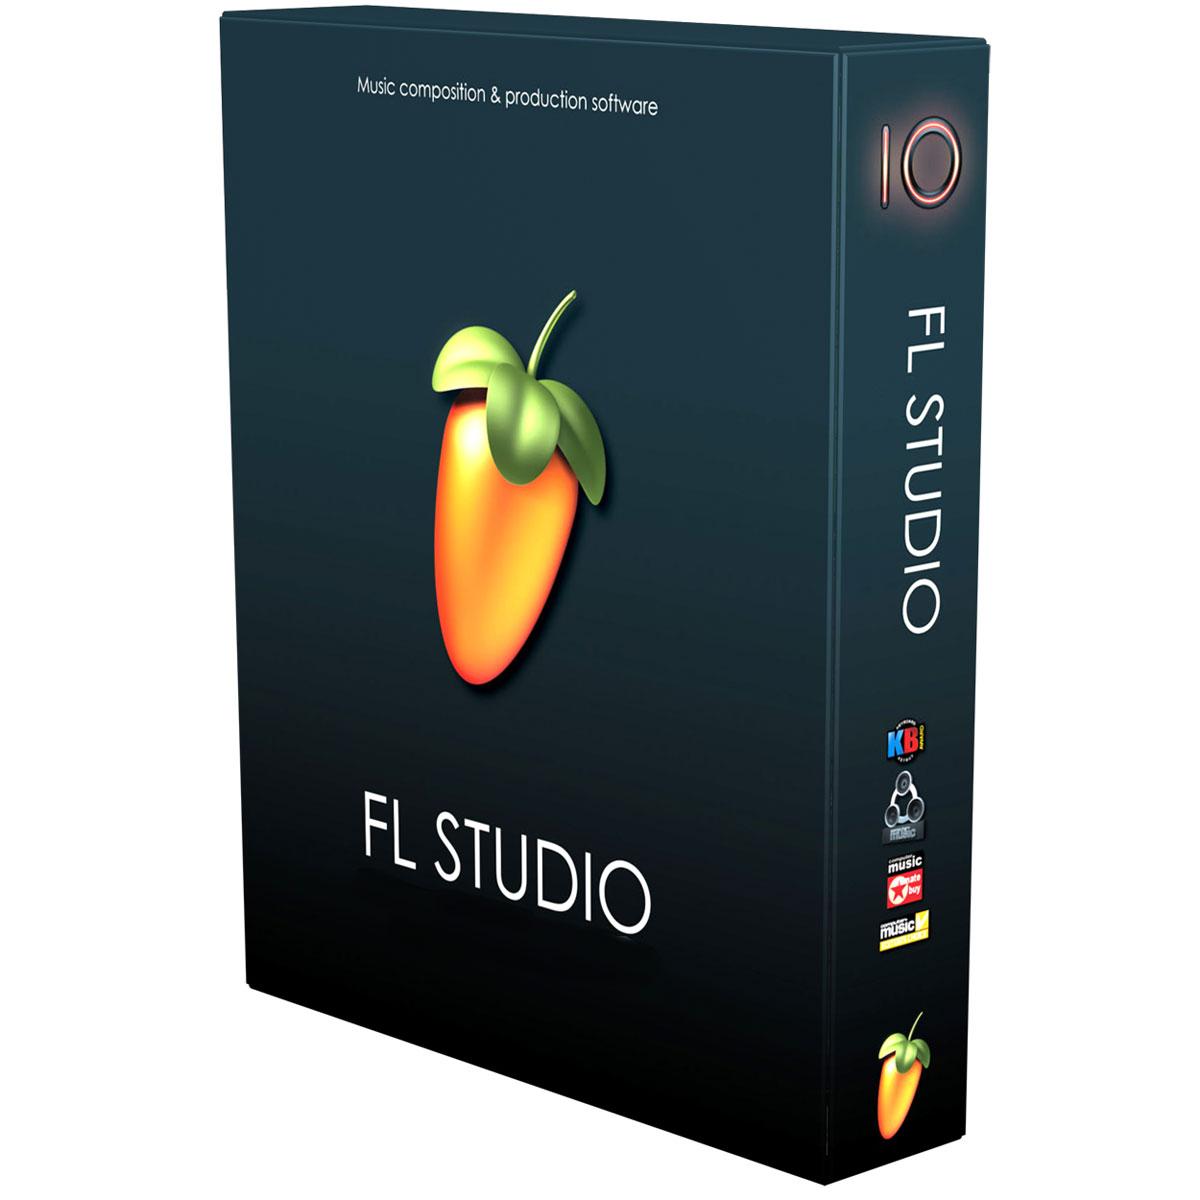 FL Studio 10 Logiciel Image Amp Son Image Line Sur